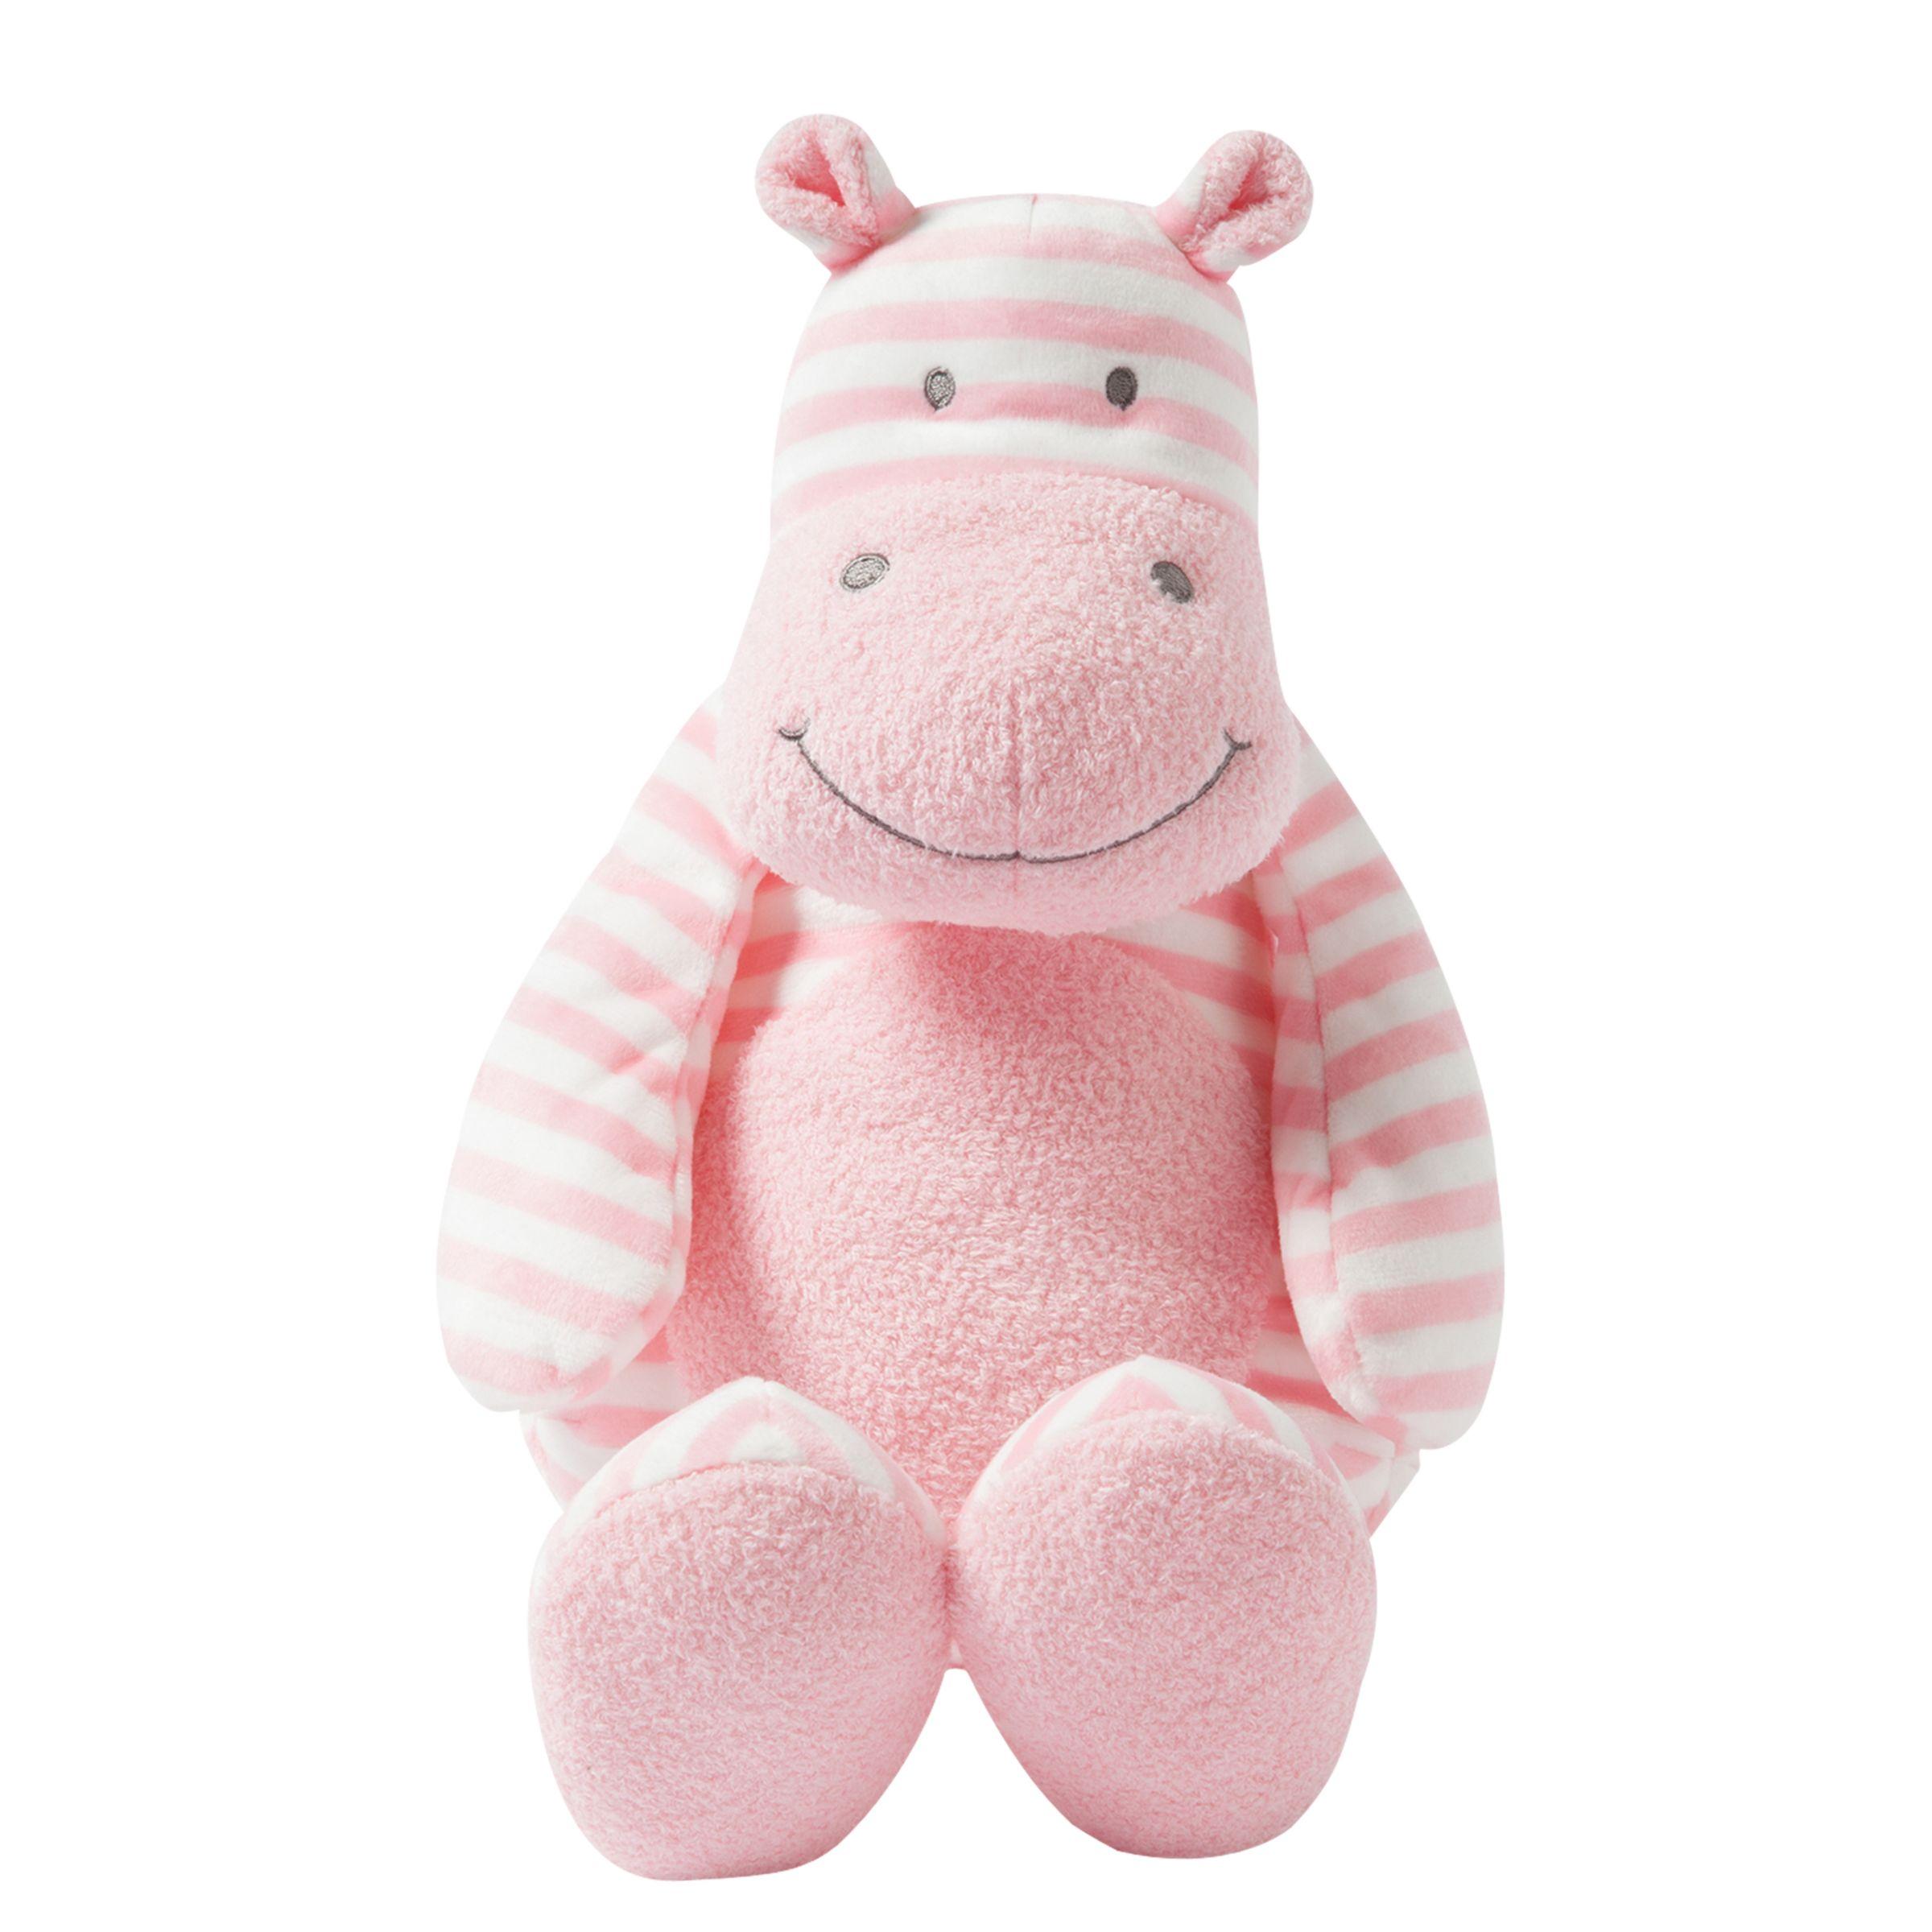 Manhattan Toy Manhattan Toy Giggle Hippo Soft Toy, Large